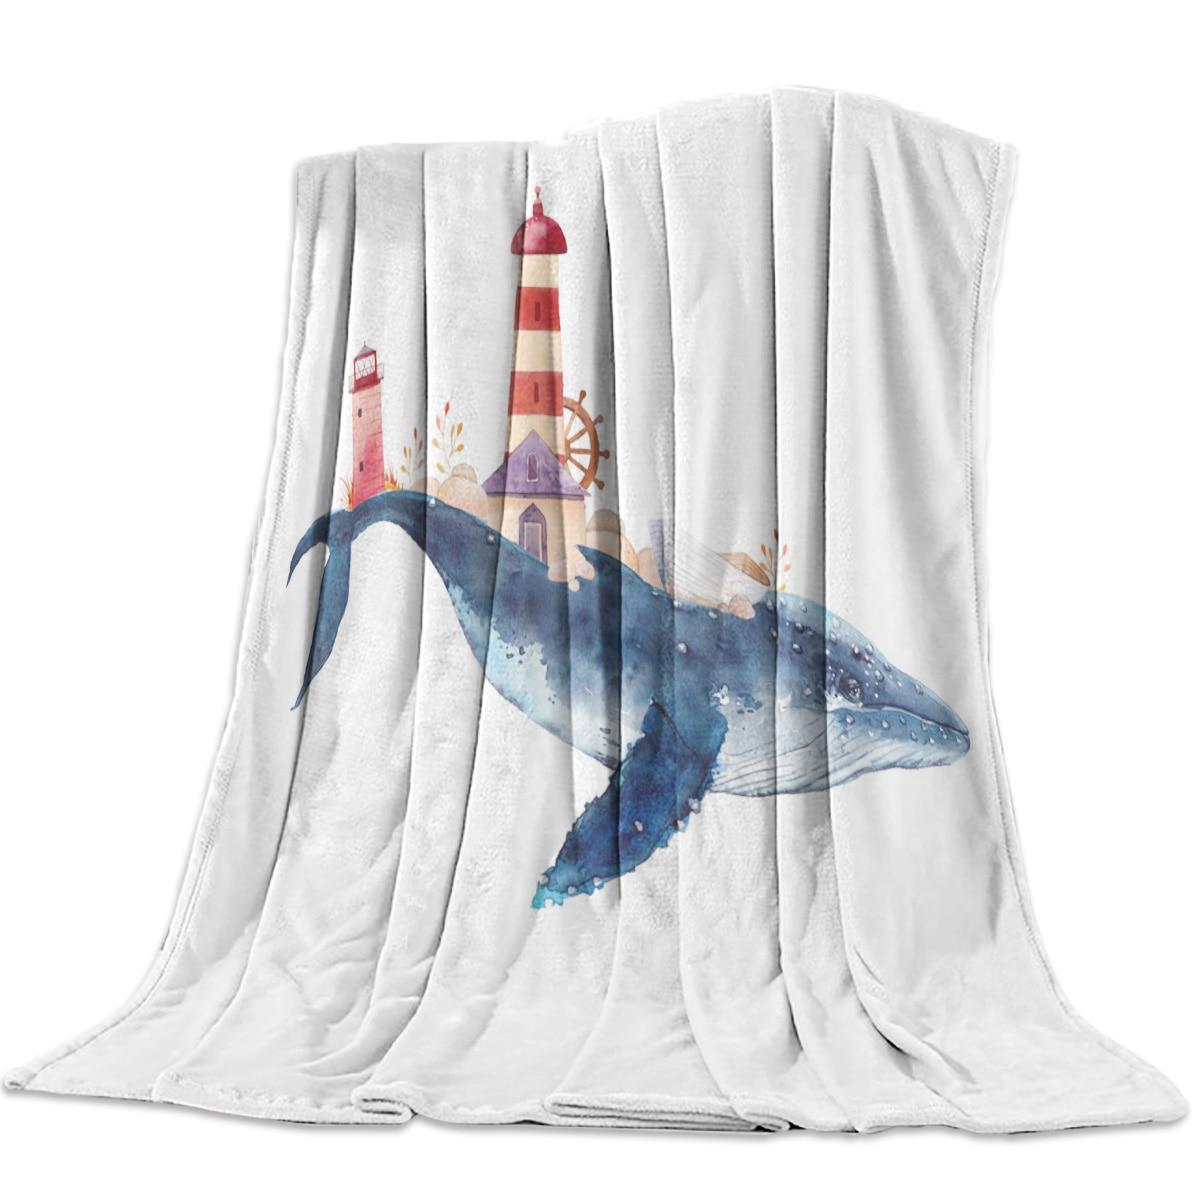 Manta ballena acuarelas faro arte Animal estilo Retro fantasía franela manta suave manta sofá cama viaje